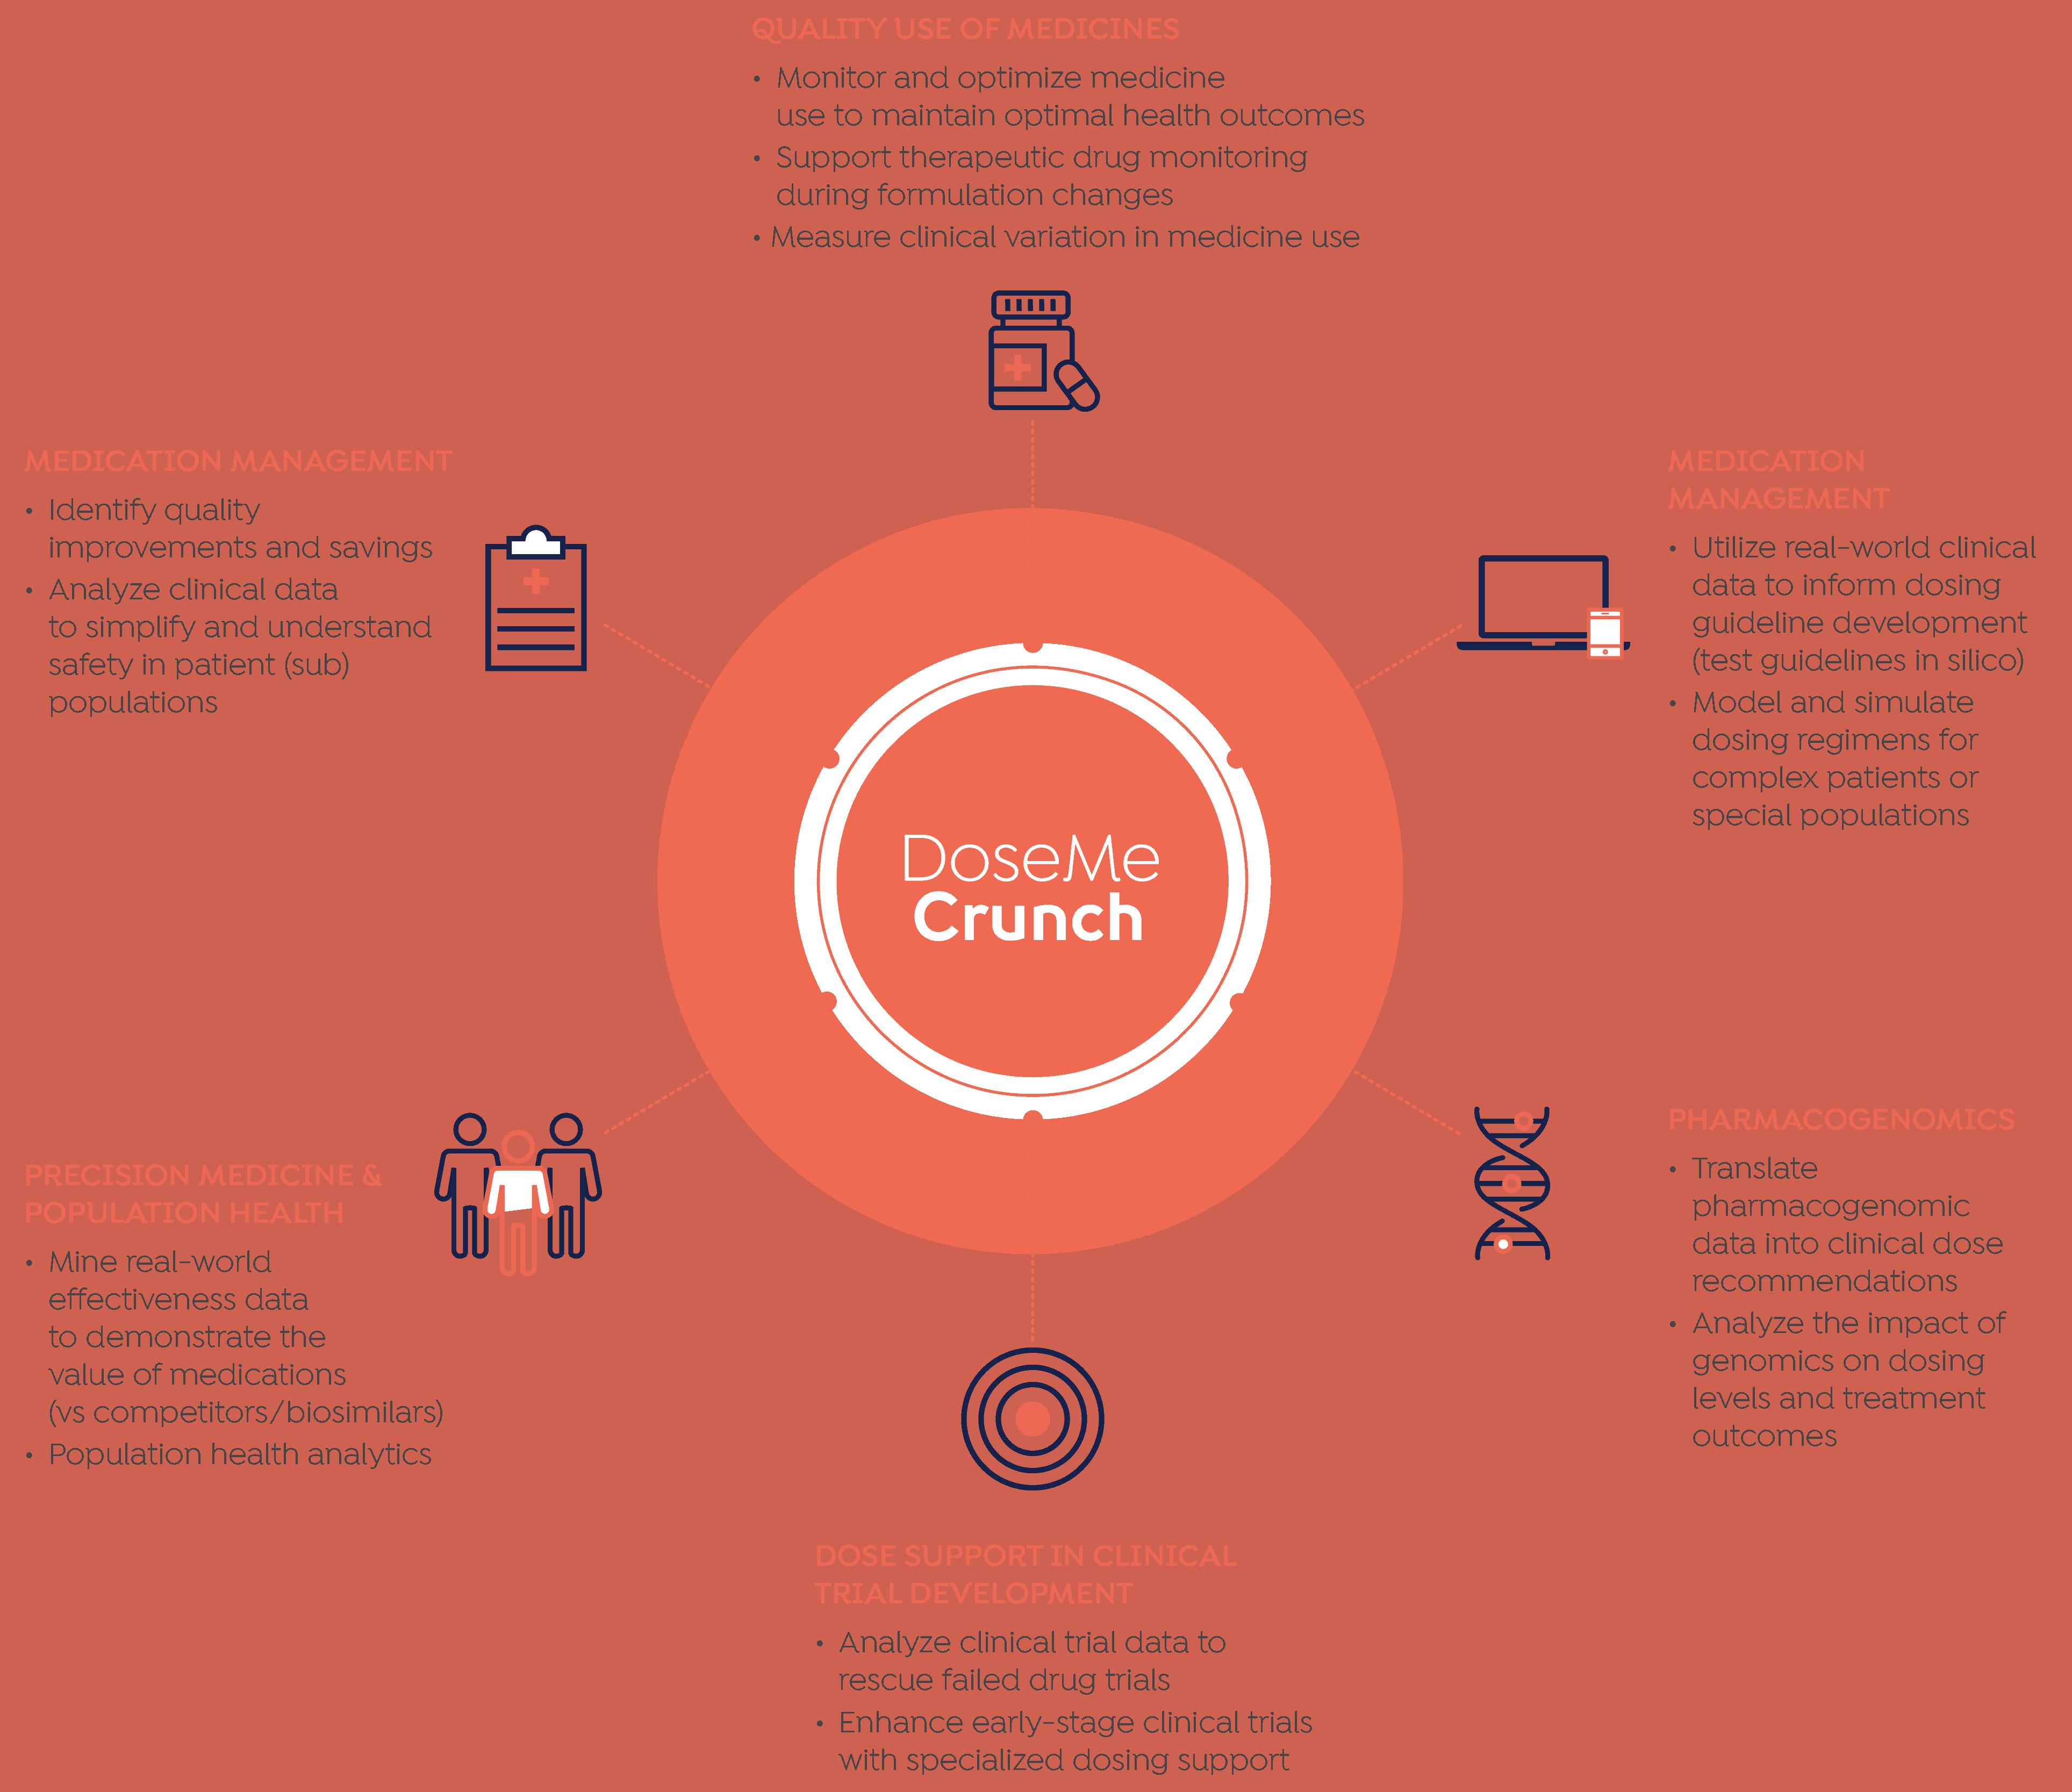 DoseMe Crunch